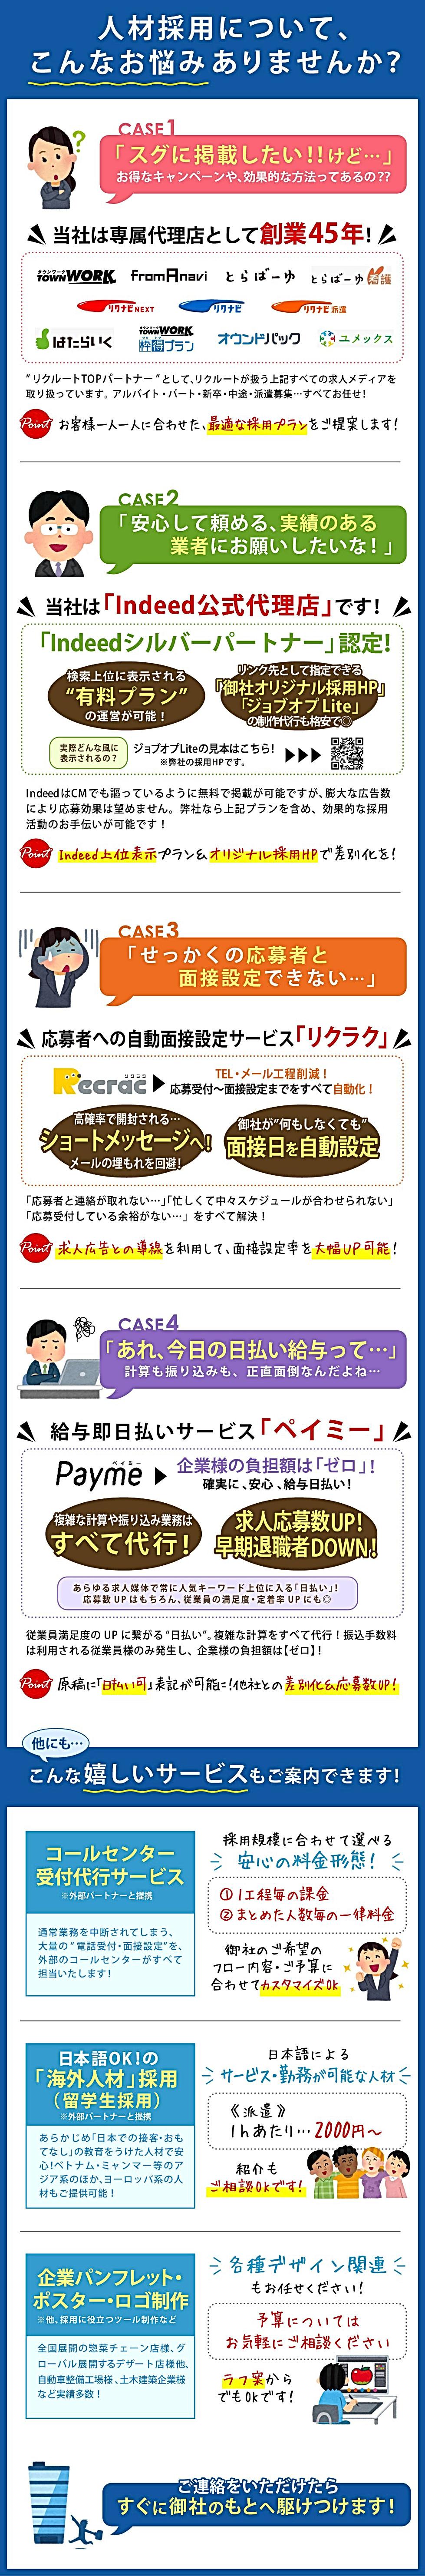 FM媒体_売り込みツール.jpg